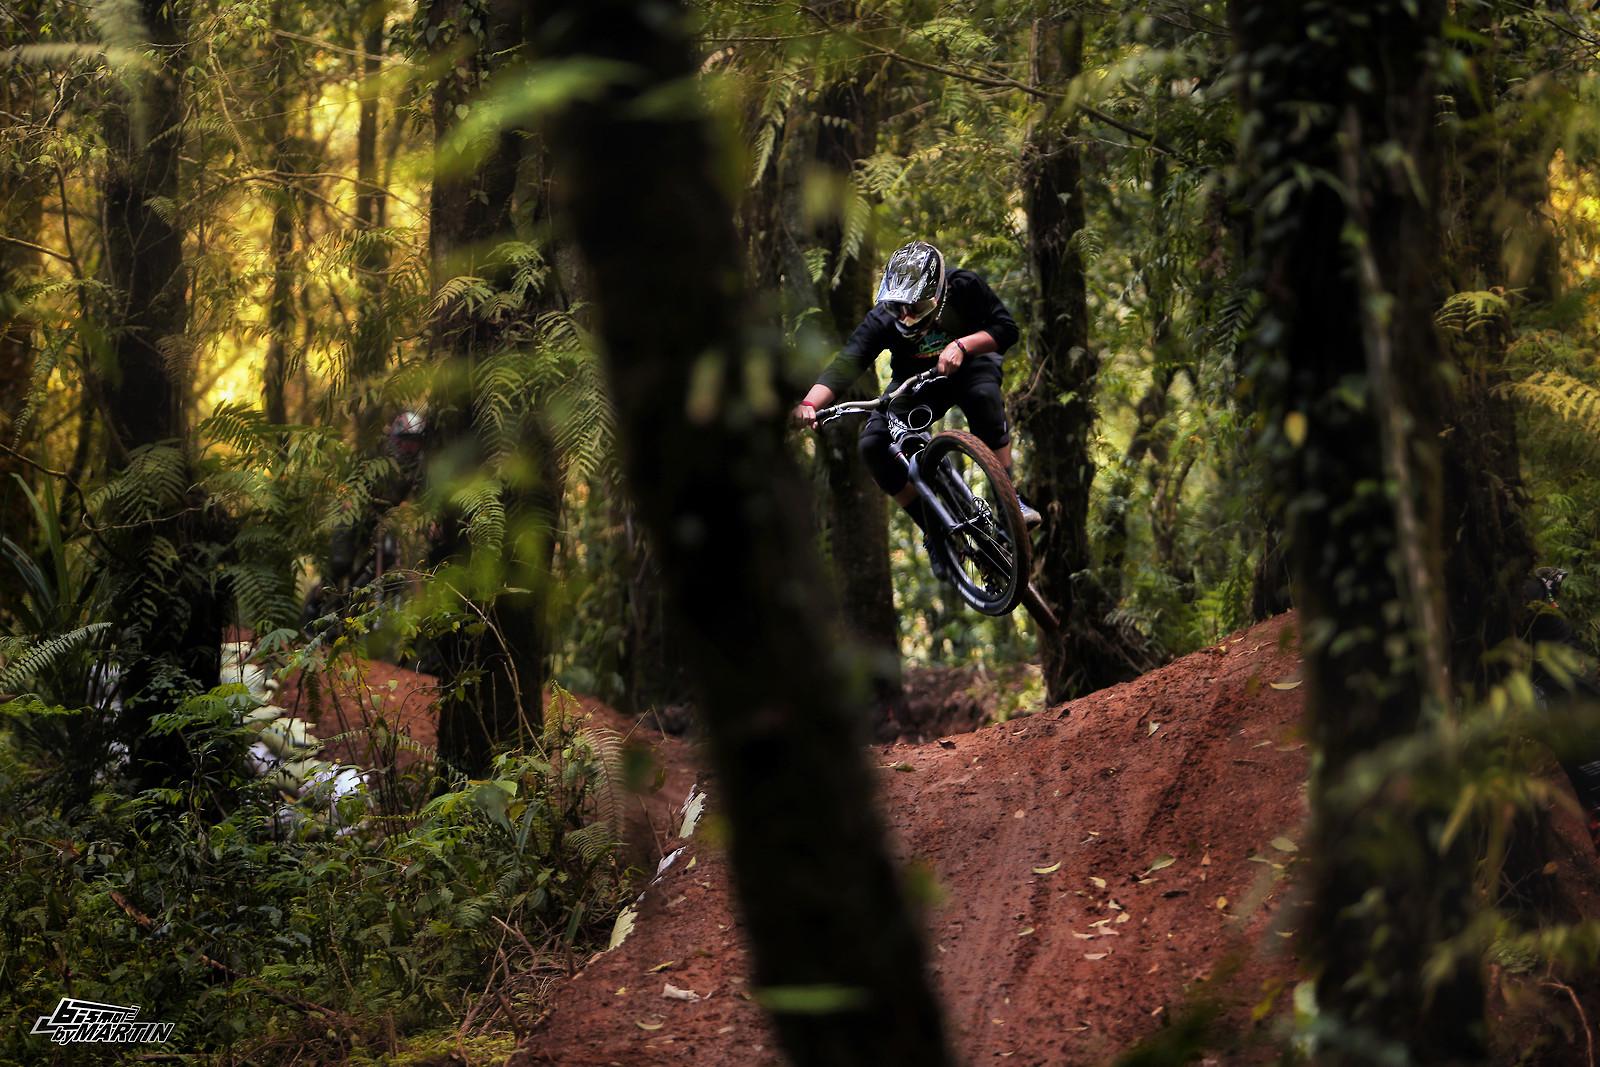 IMG 9249-01MX - bismojo - Mountain Biking Pictures - Vital MTB